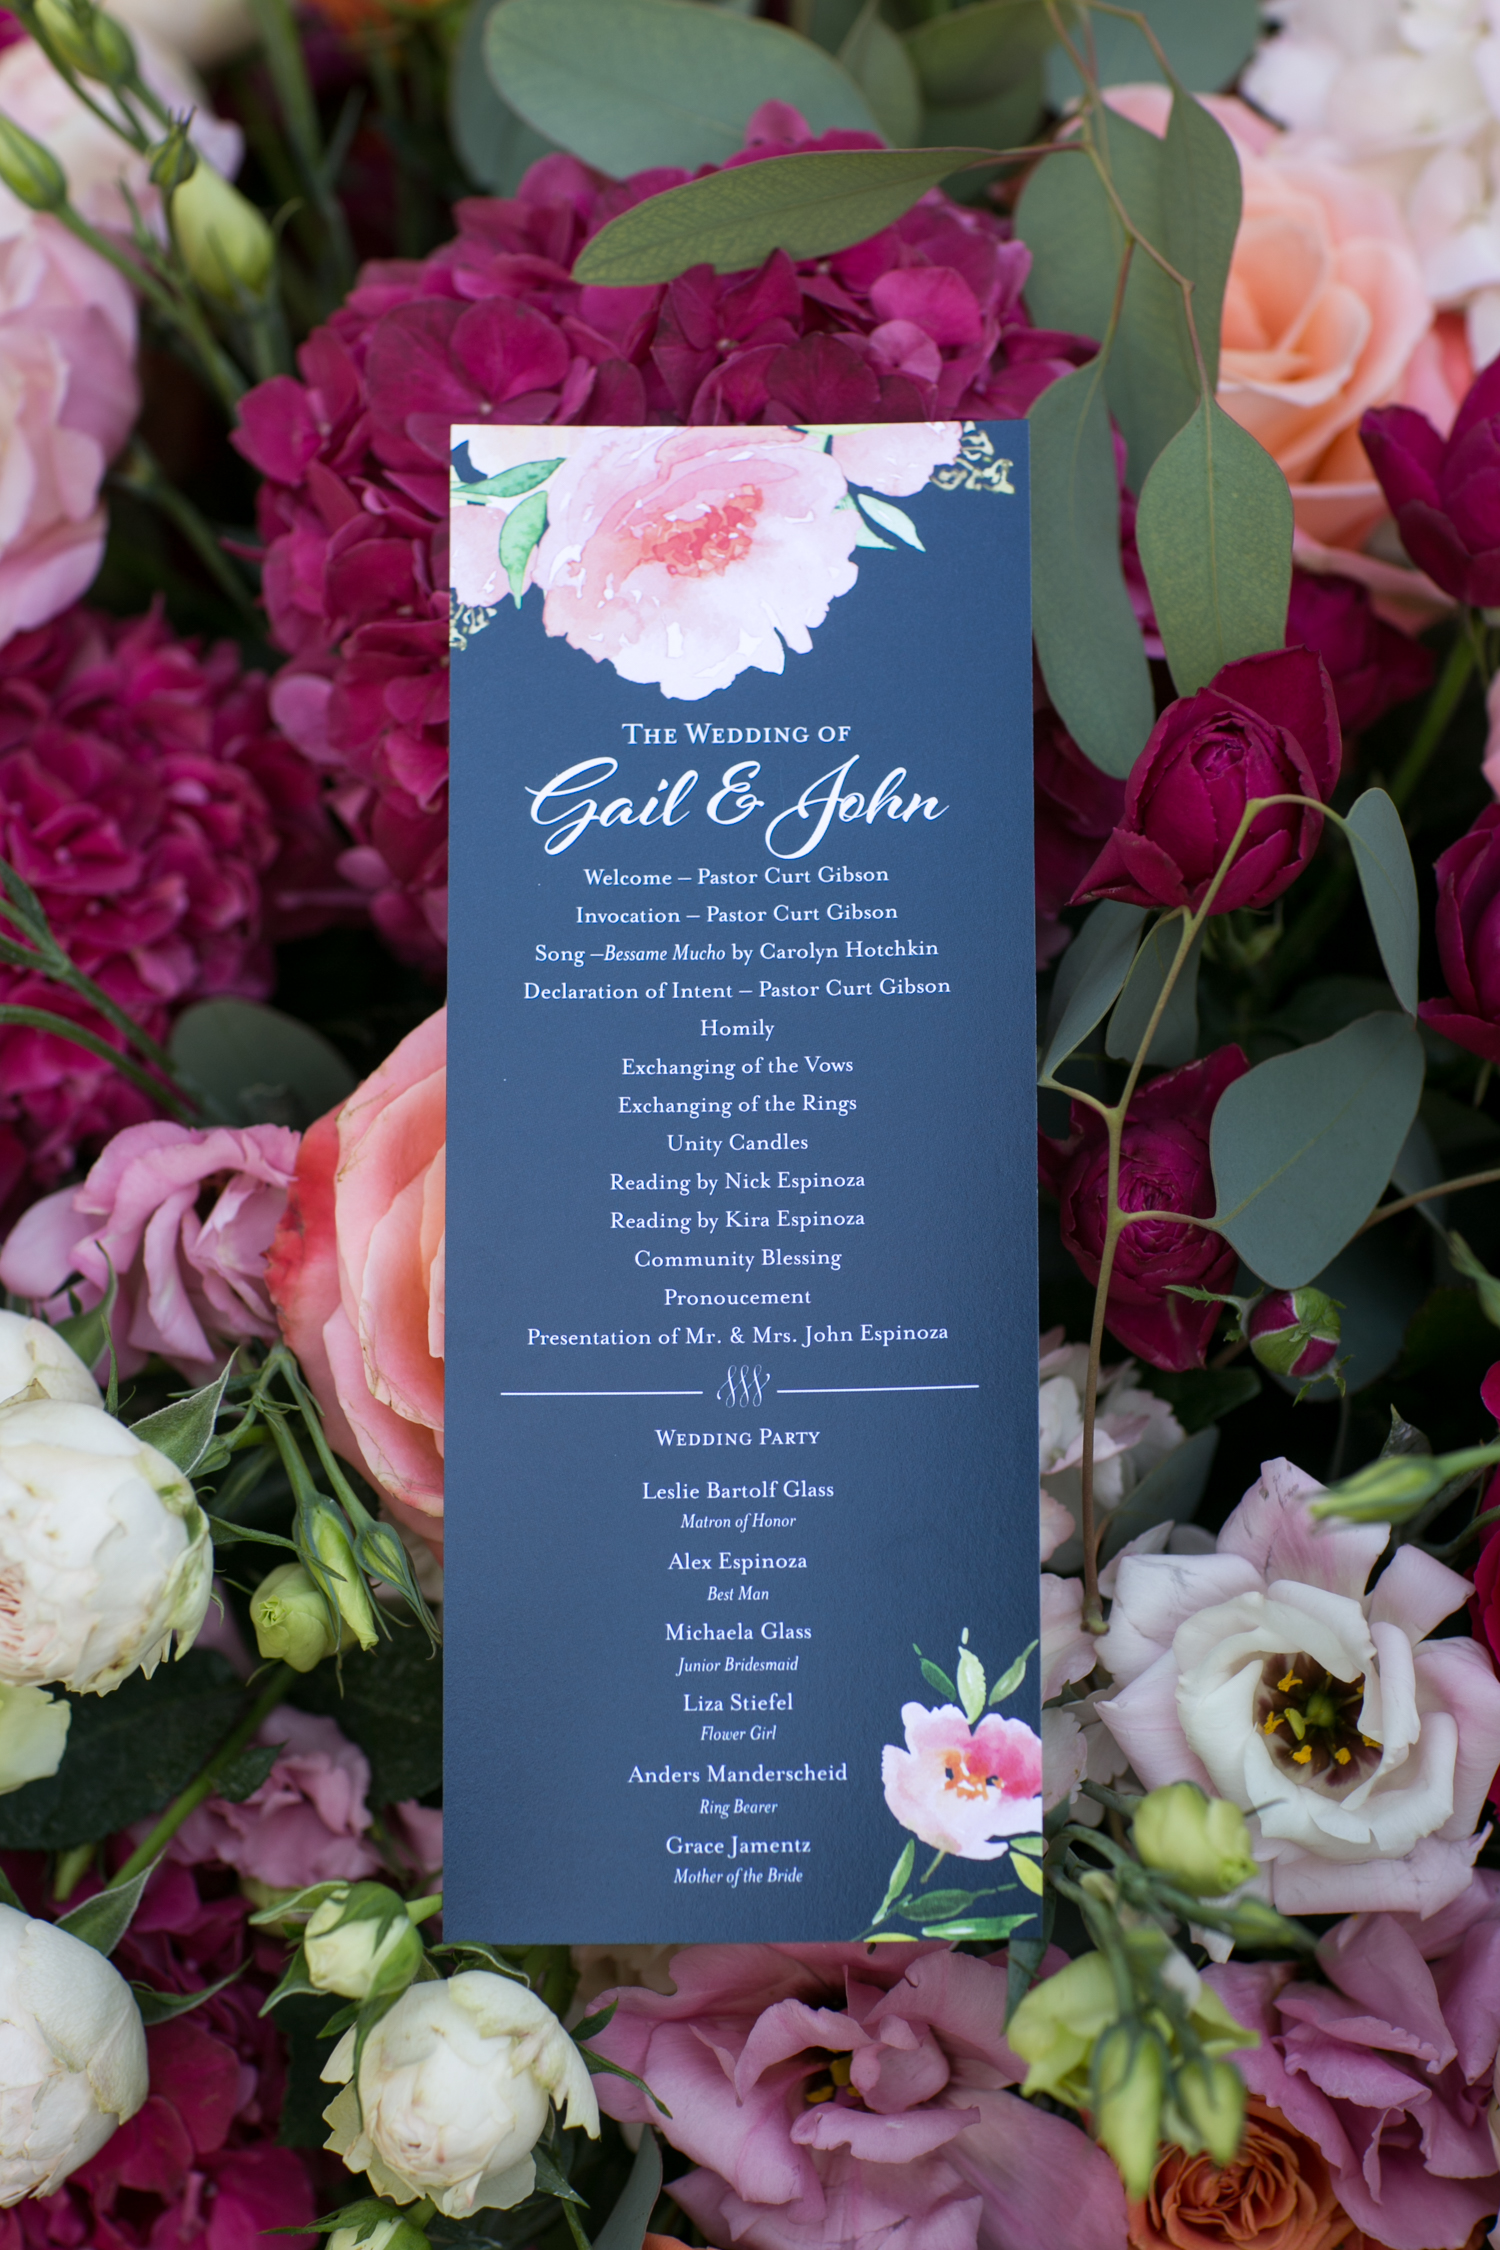 www.santabarbarawedding.com | Miki & Sonja Photography | Four Seasons Resort The Biltmore | Imagine Weddings & Special Events | Rockrose Floral Design | Welcome Sign